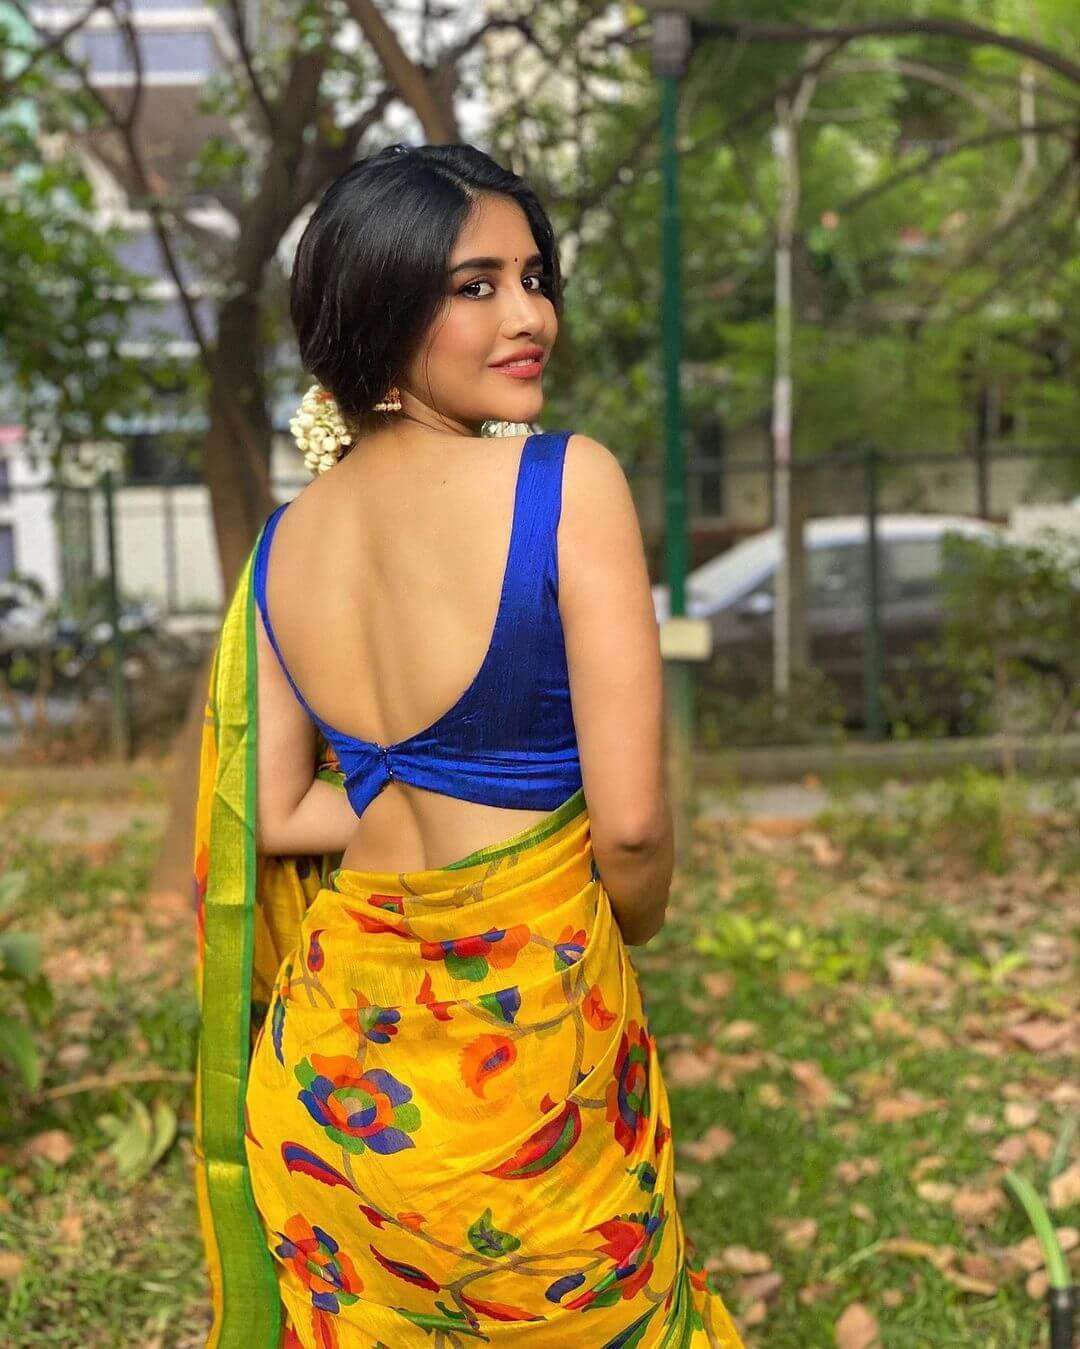 Nabha Natesh Showing Her Back